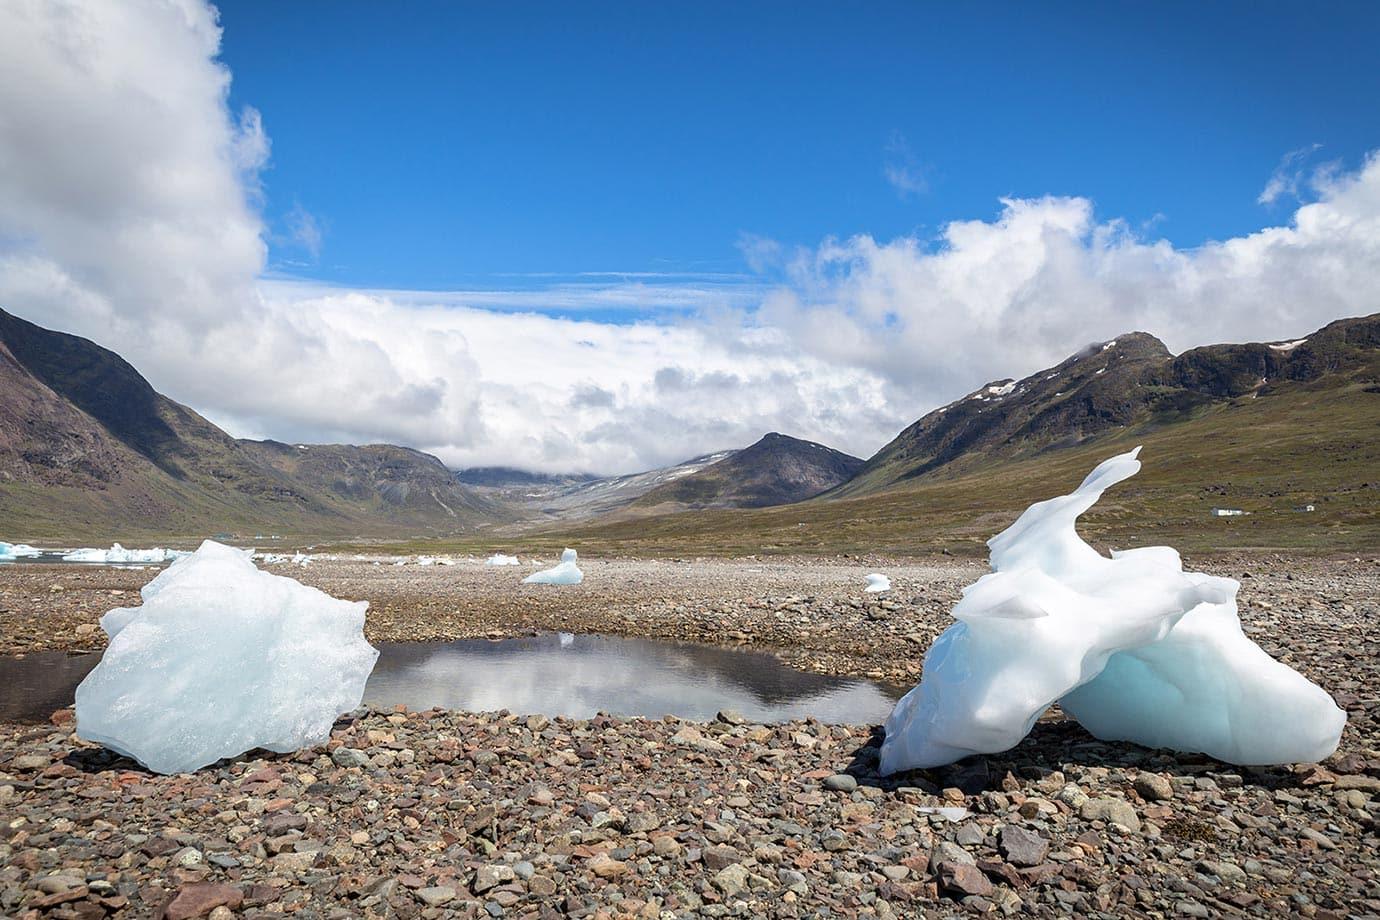 Iceberg beach in Greenland